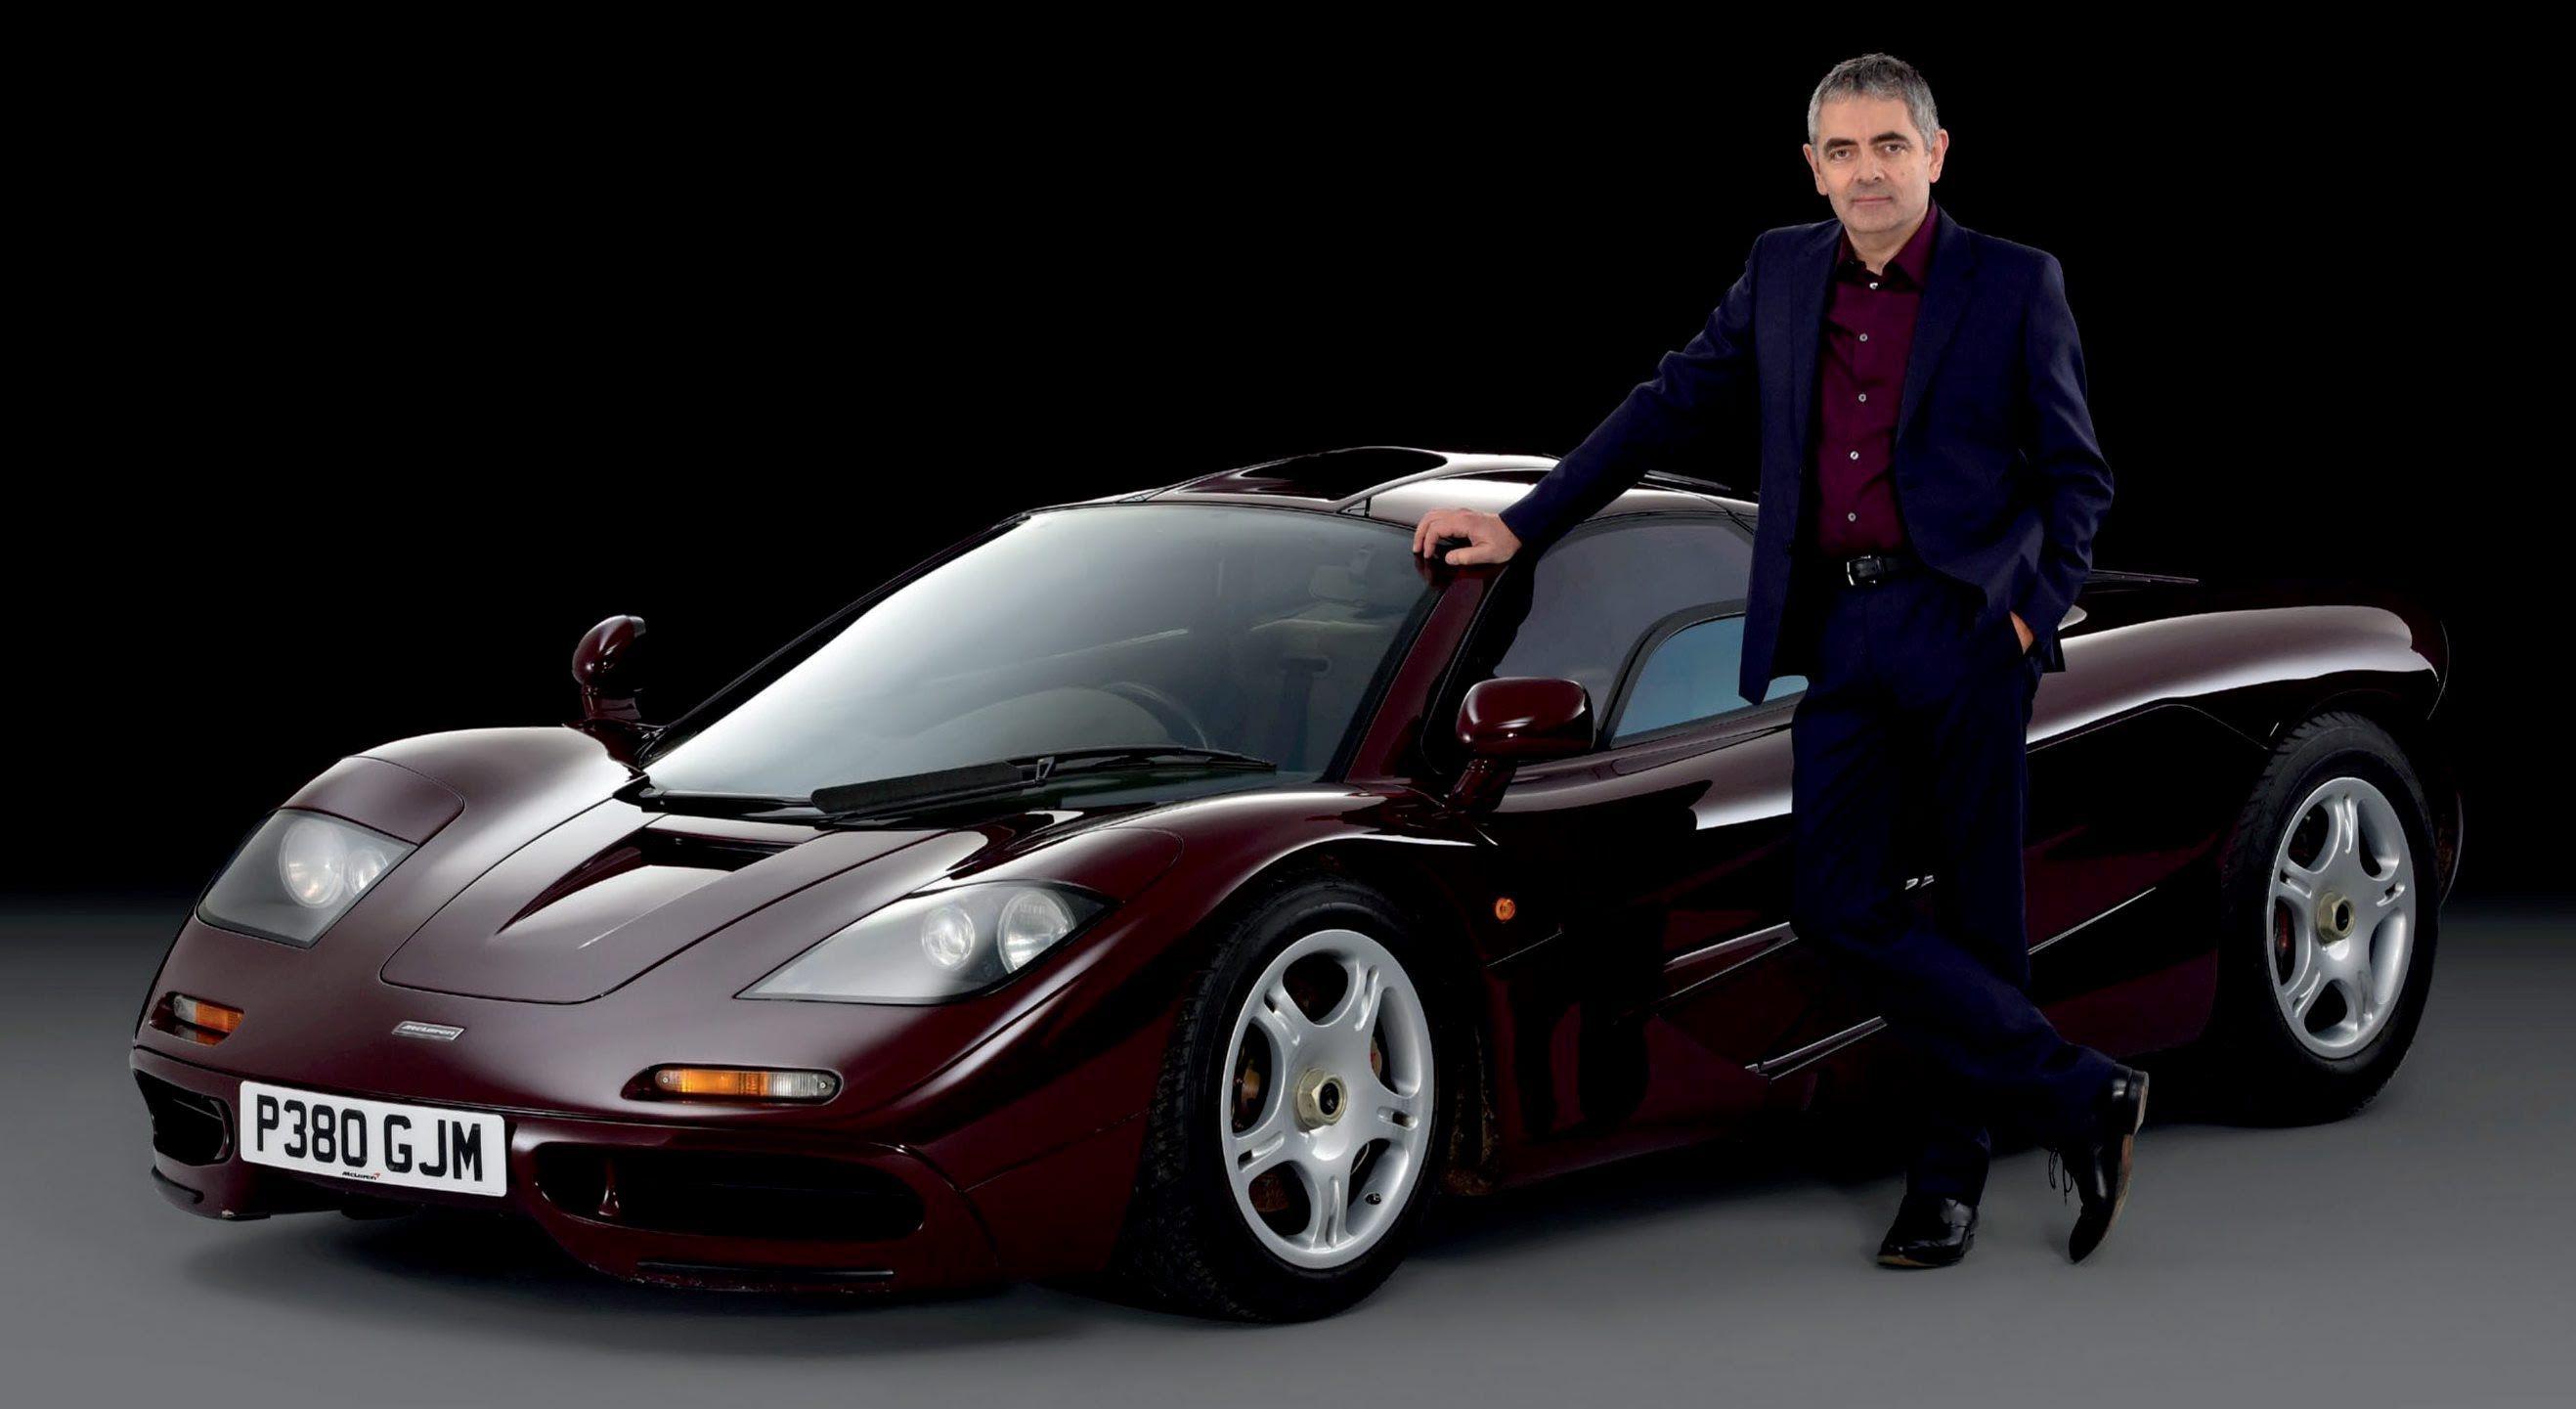 Rowan atkinson s car collection 2016 mr bean s real